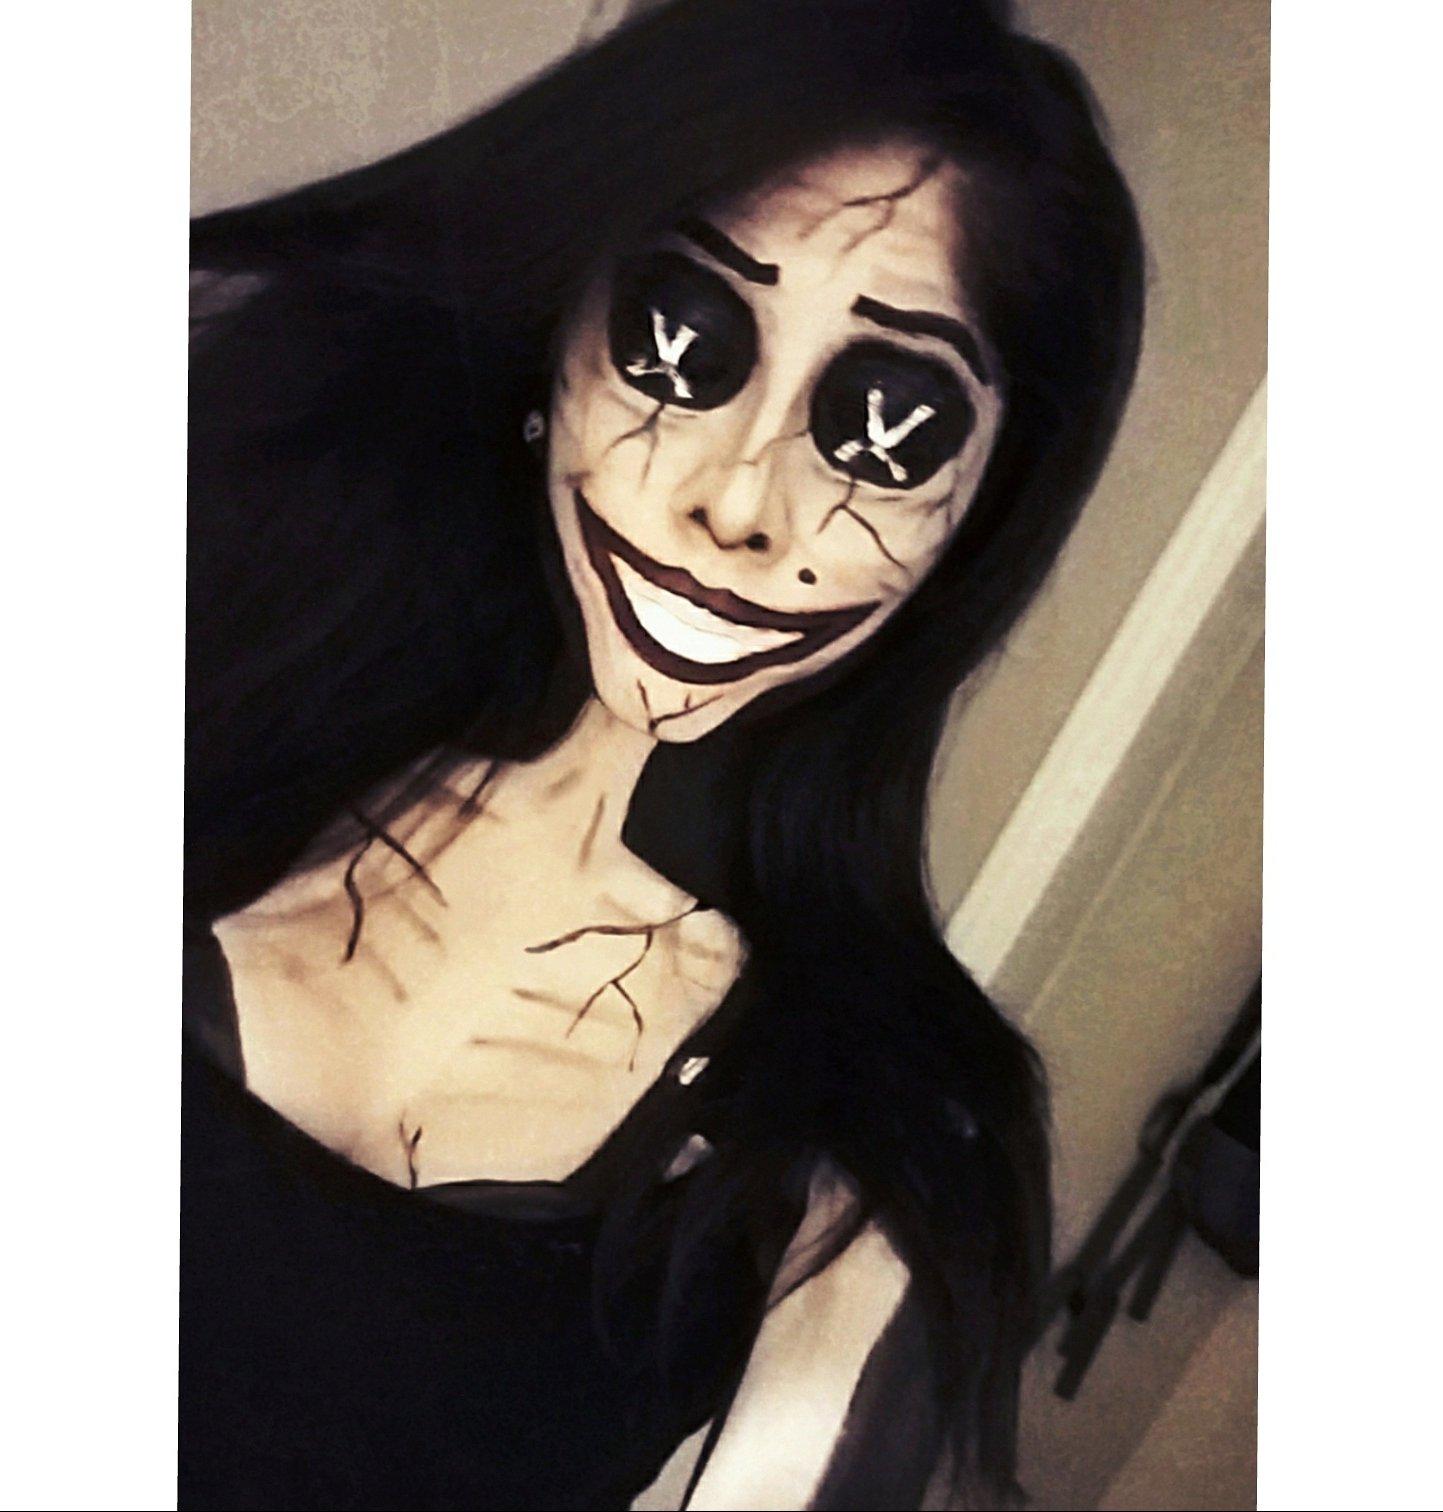 Marlena Ochoa On Twitter I Am Your Other Mother Coraline Makeup Facepaint Coraline Othermother Souls Creepy Horror Cosplay Children Mehron Art Evil Https T Co J0aikvokhm